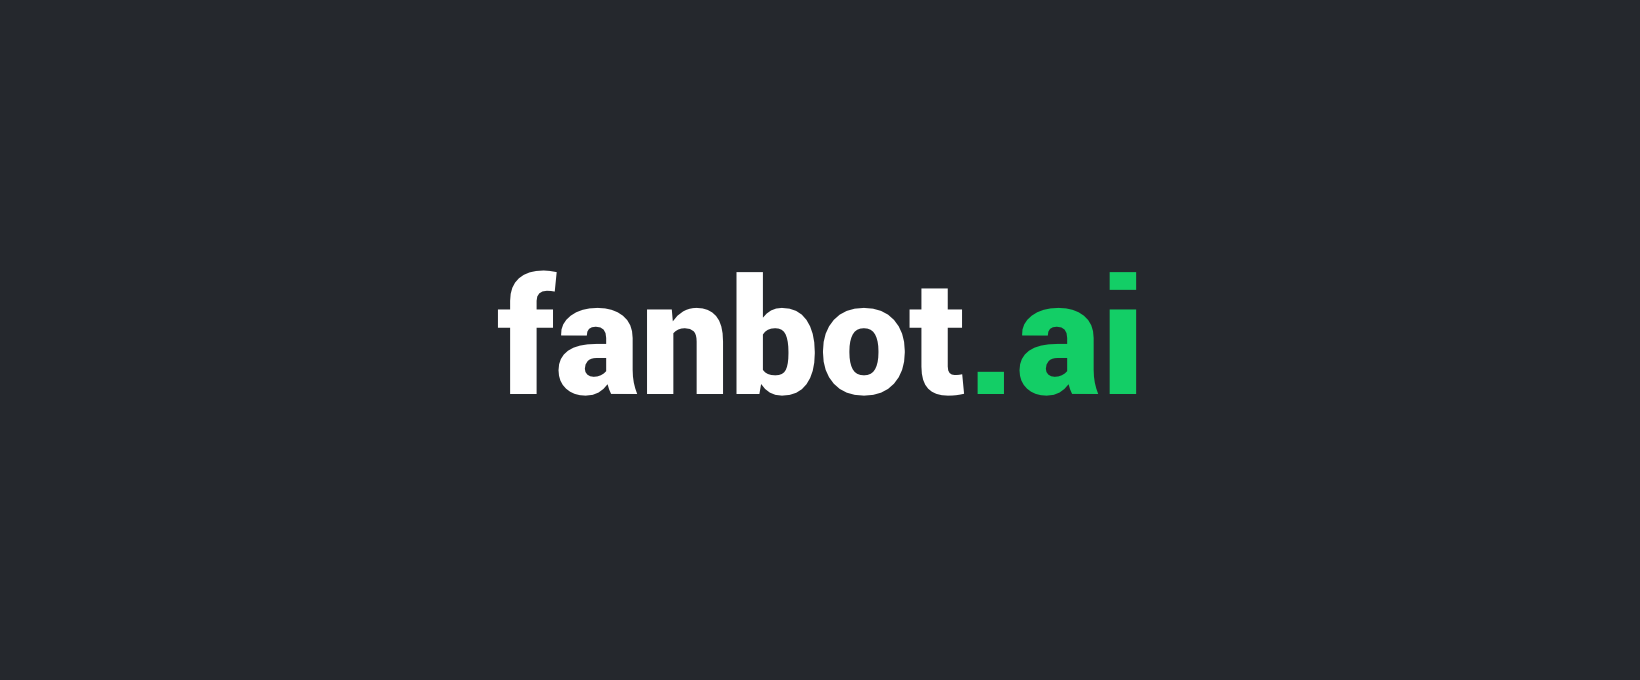 Fanbot ai - bot platform for marketing, sales and fan engagement